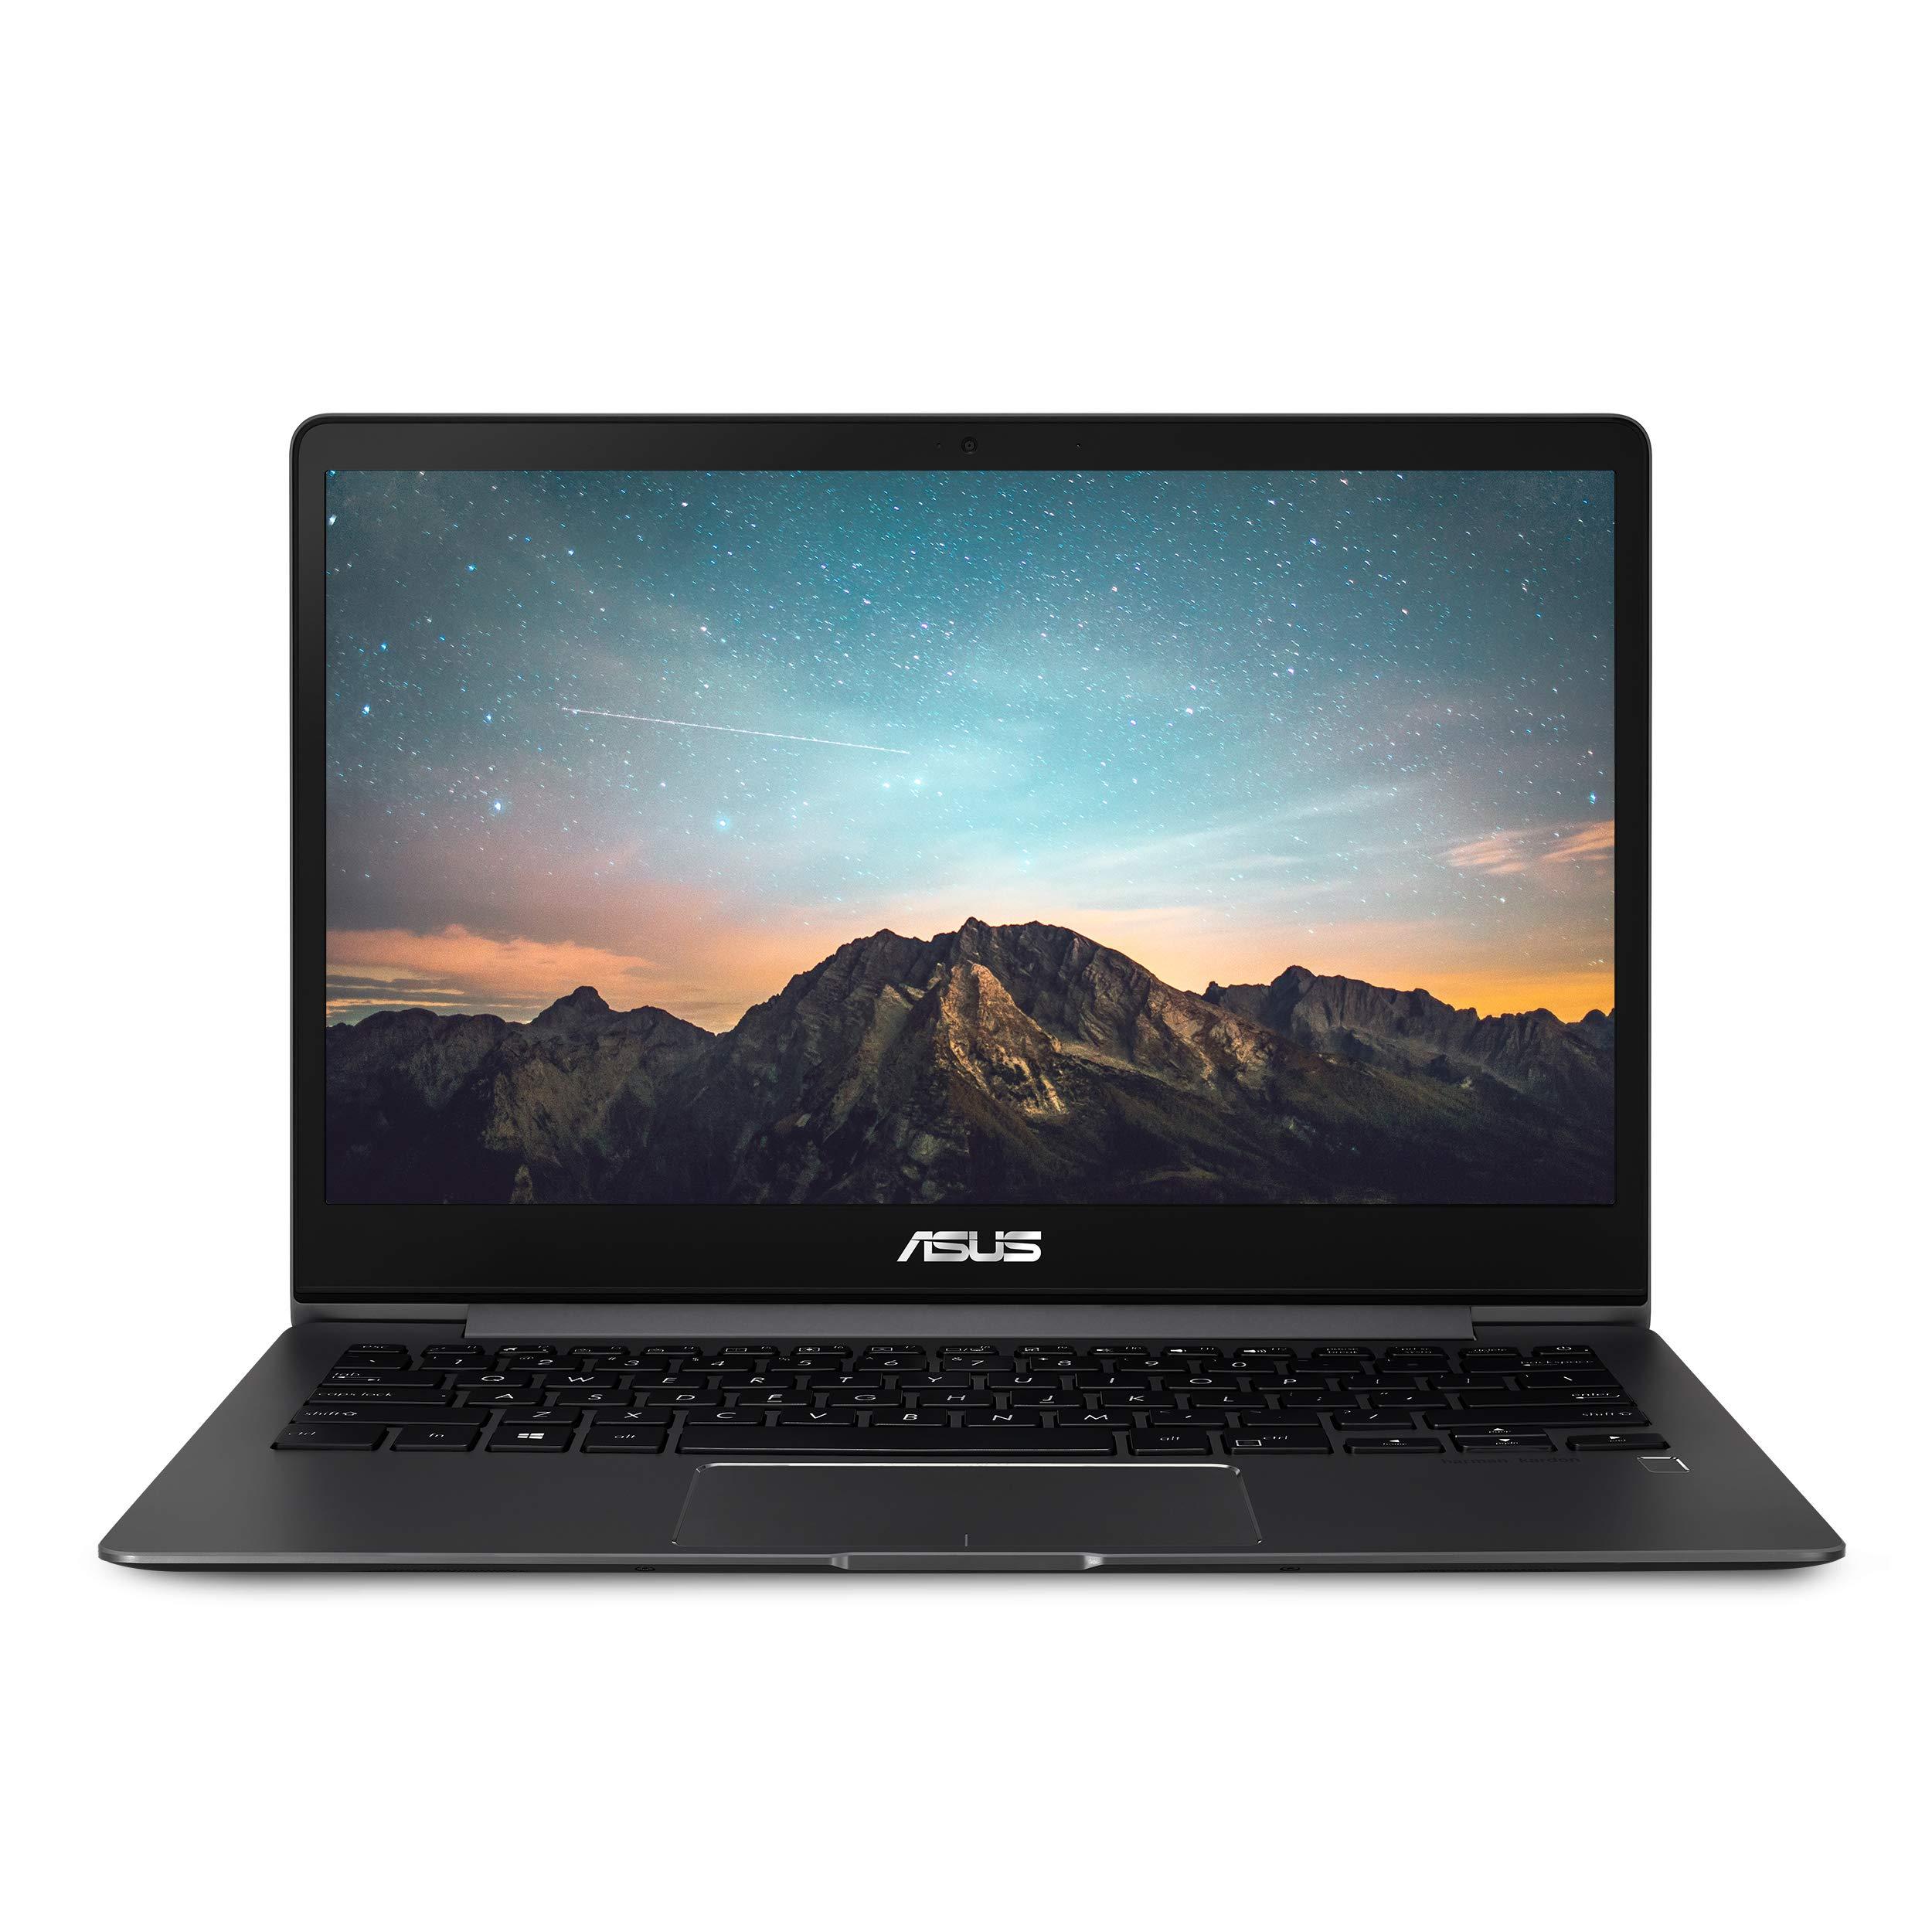 Asus ZenBook 13 Ultra-Slim Laptop, 13.3'' Full HD Wideview, 8th Gen Intel Core I5-8265U, 8GB LPDDR3, 512GB PCIe SSD, Backlit KB, Fingerprint, Slate Gray, Windows 10, UX331FA-AS51 by ASUS